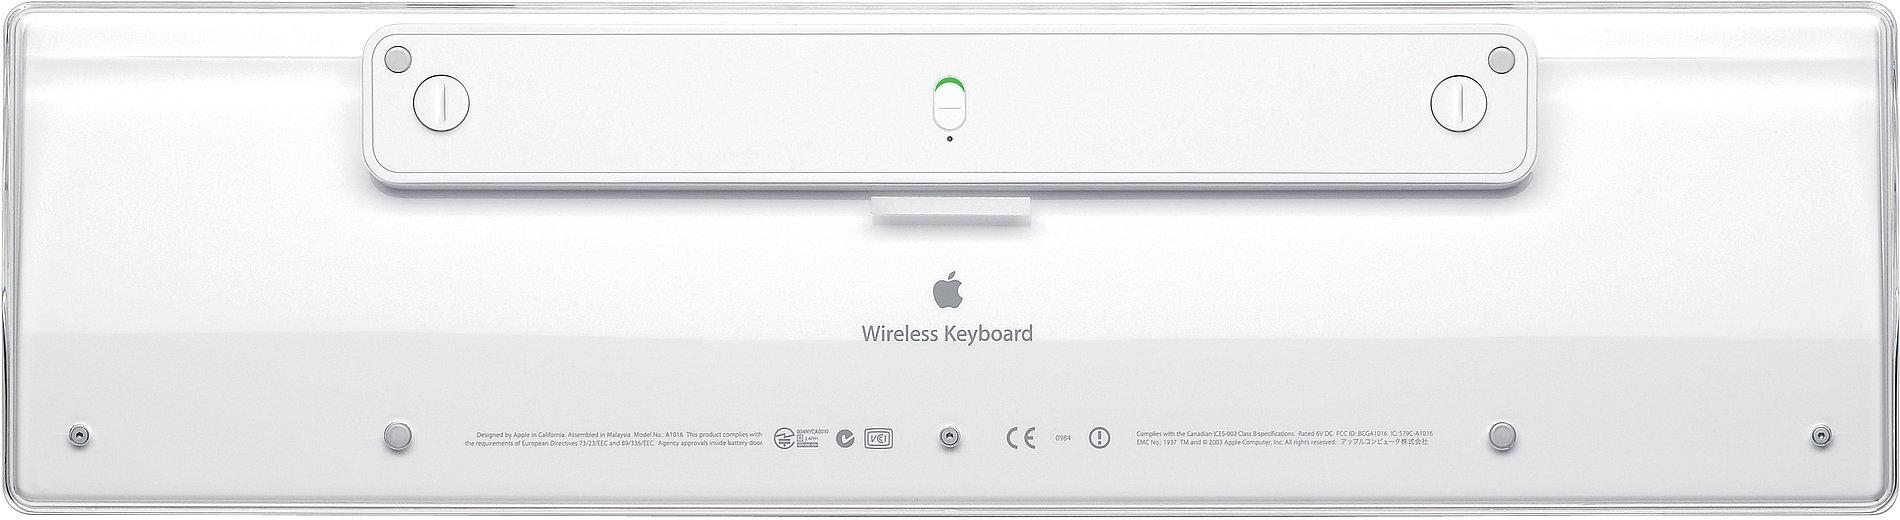 Apple Wireless Keyboard | Red Dot Design Award